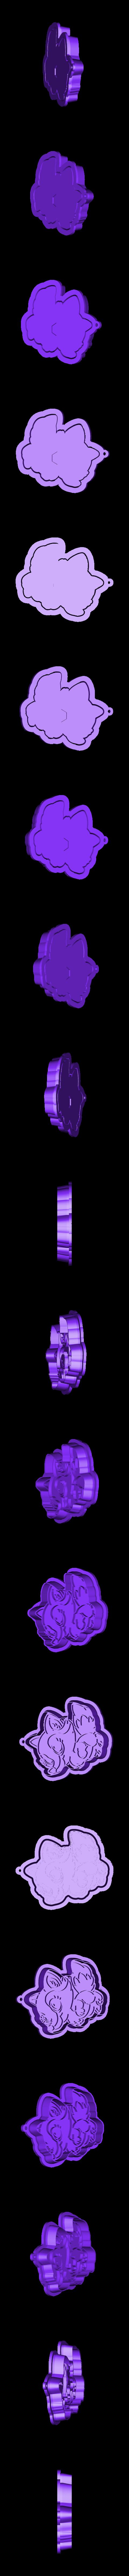 7.stl Download STL file Lady fox cookie cutter • 3D print model, 3dfactory